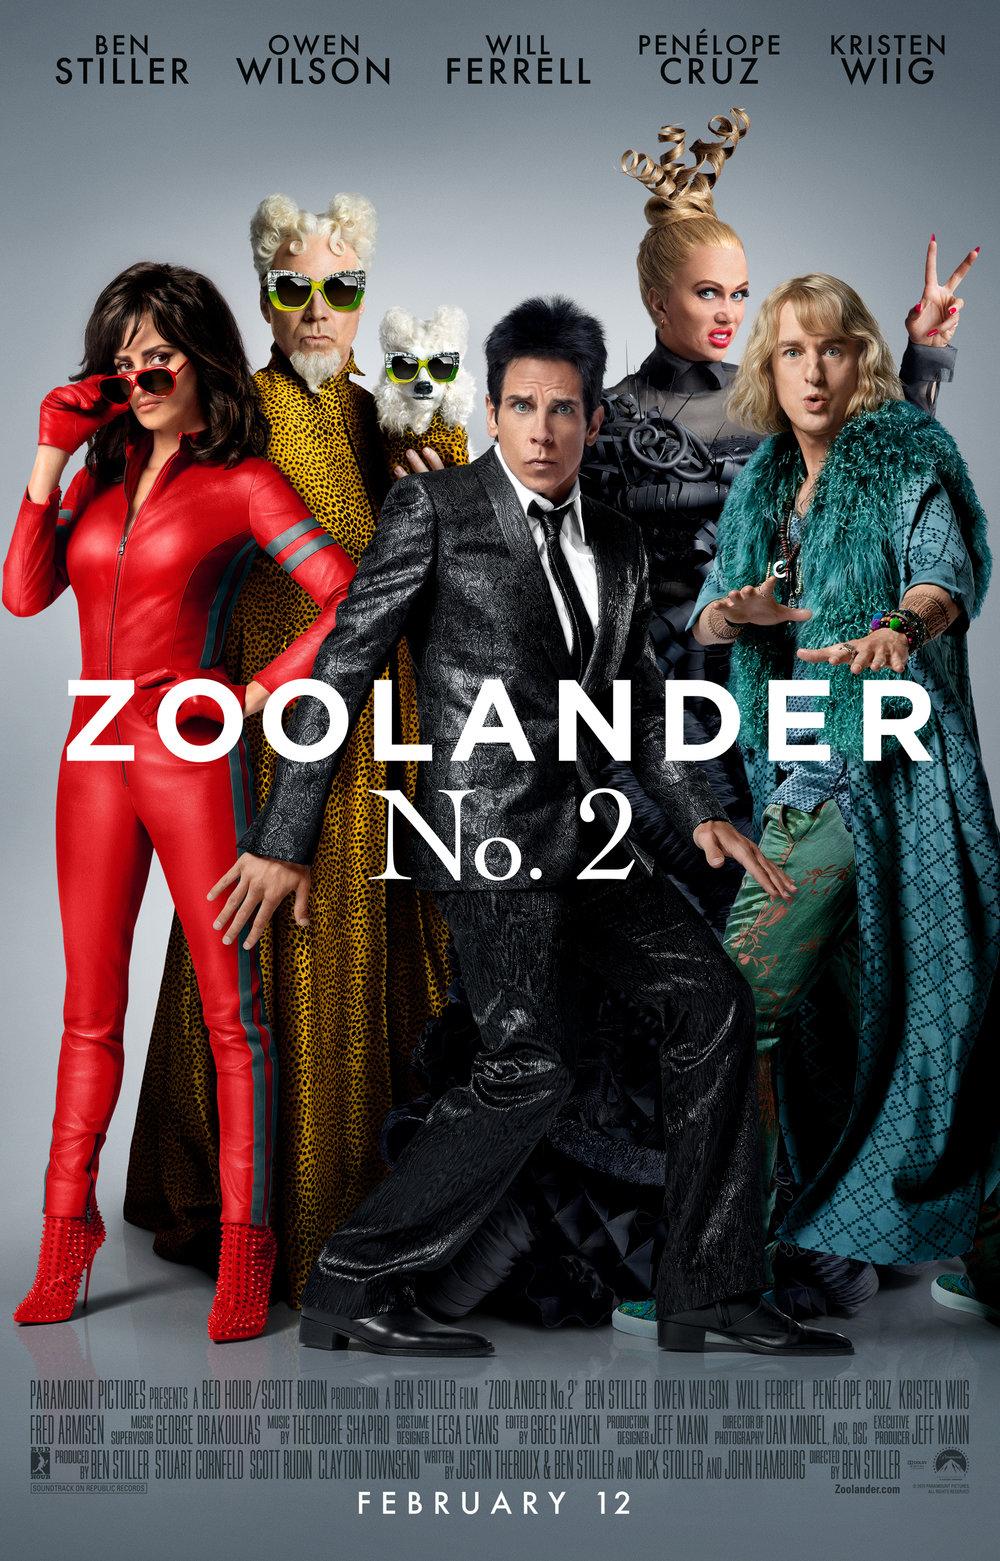 zoolander-2-poster-new-1.jpg